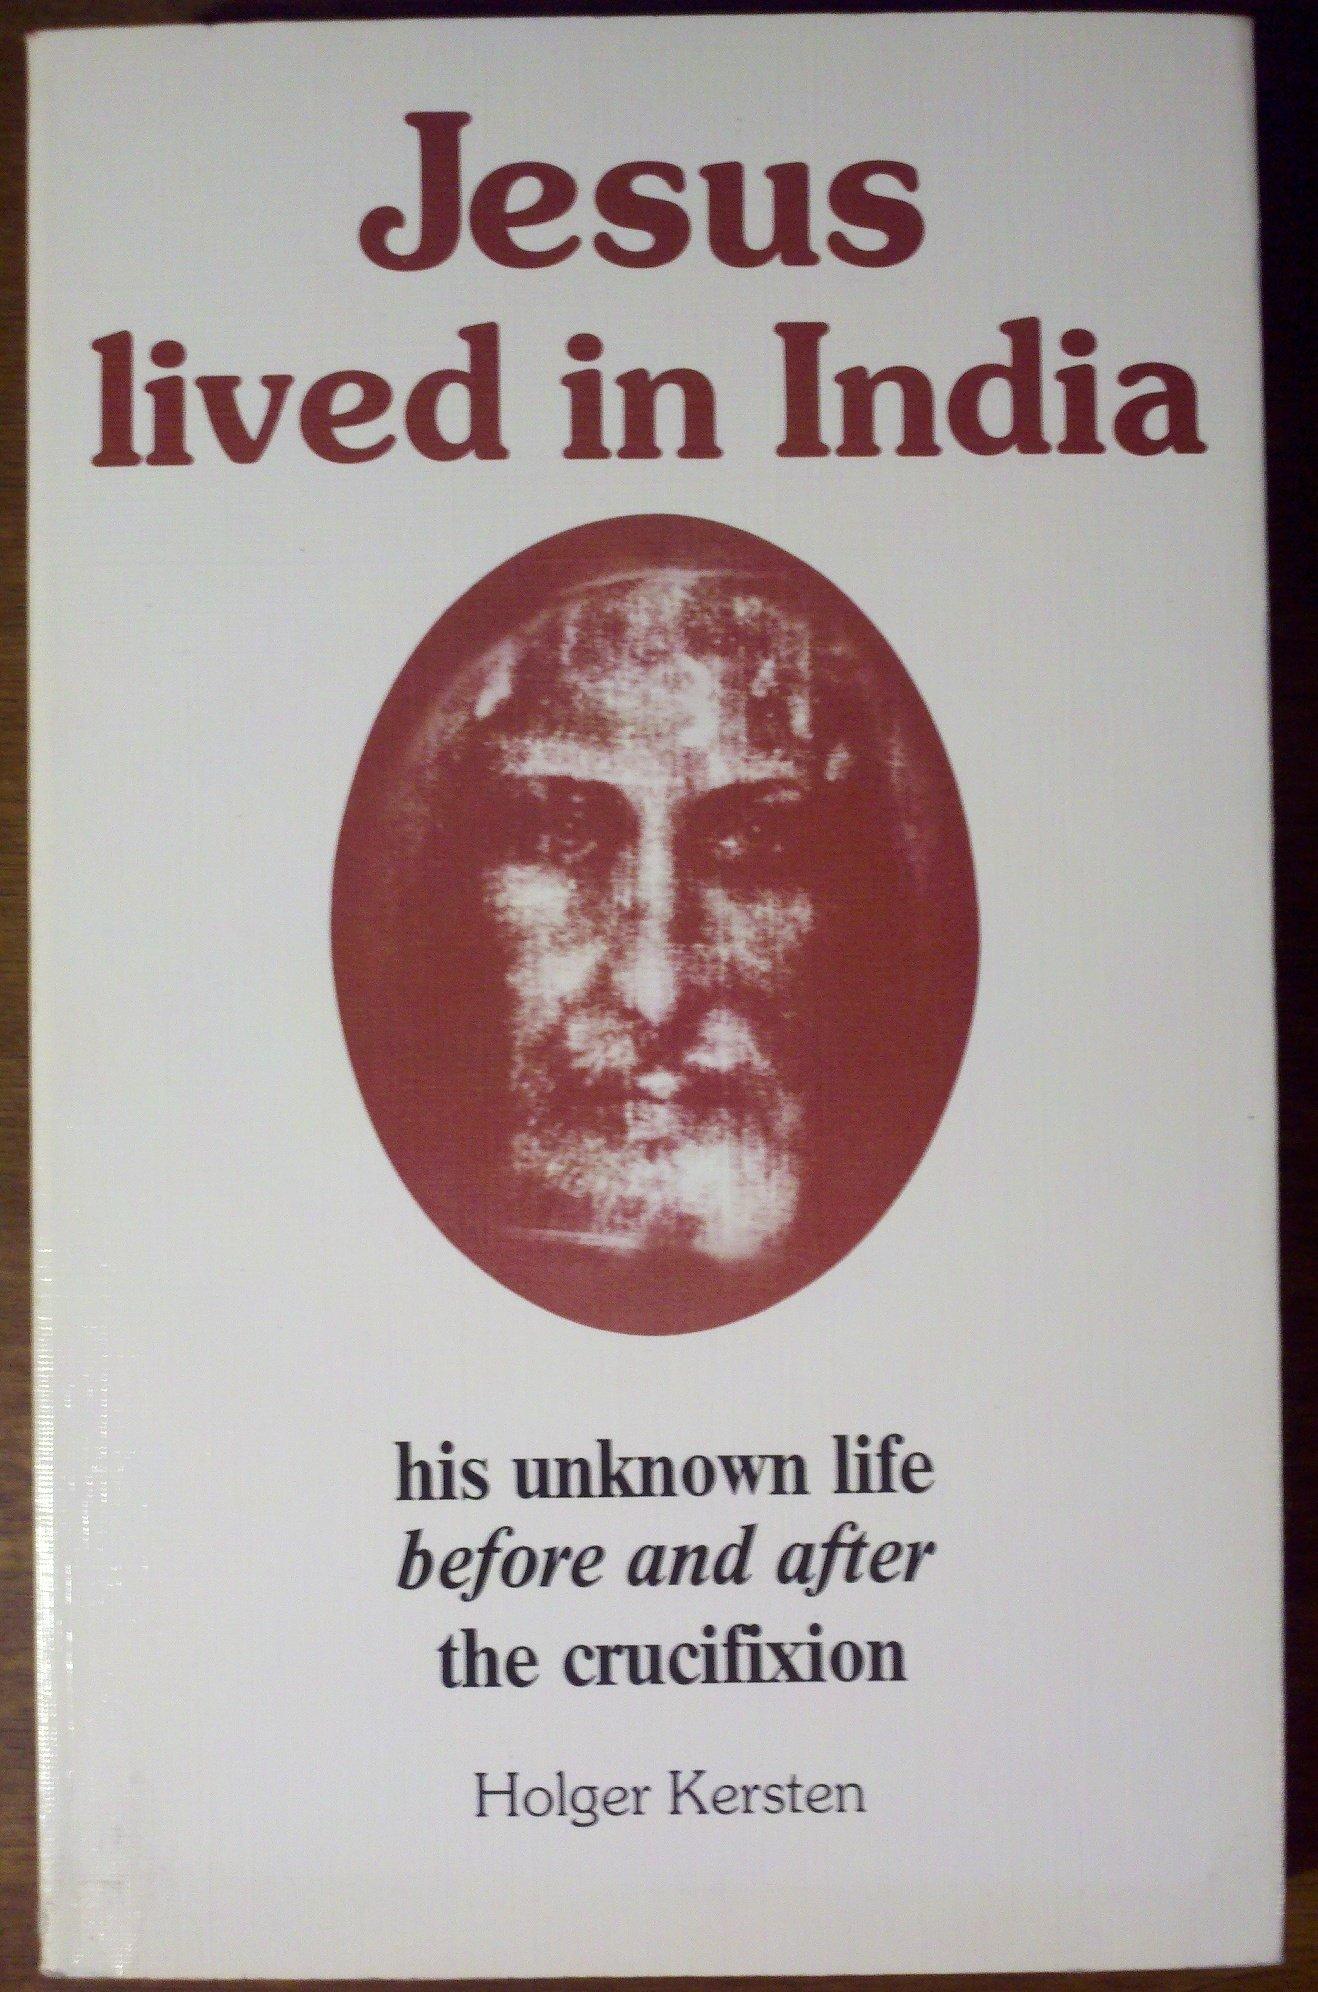 holger kirsten jesus lived in india pdf free download